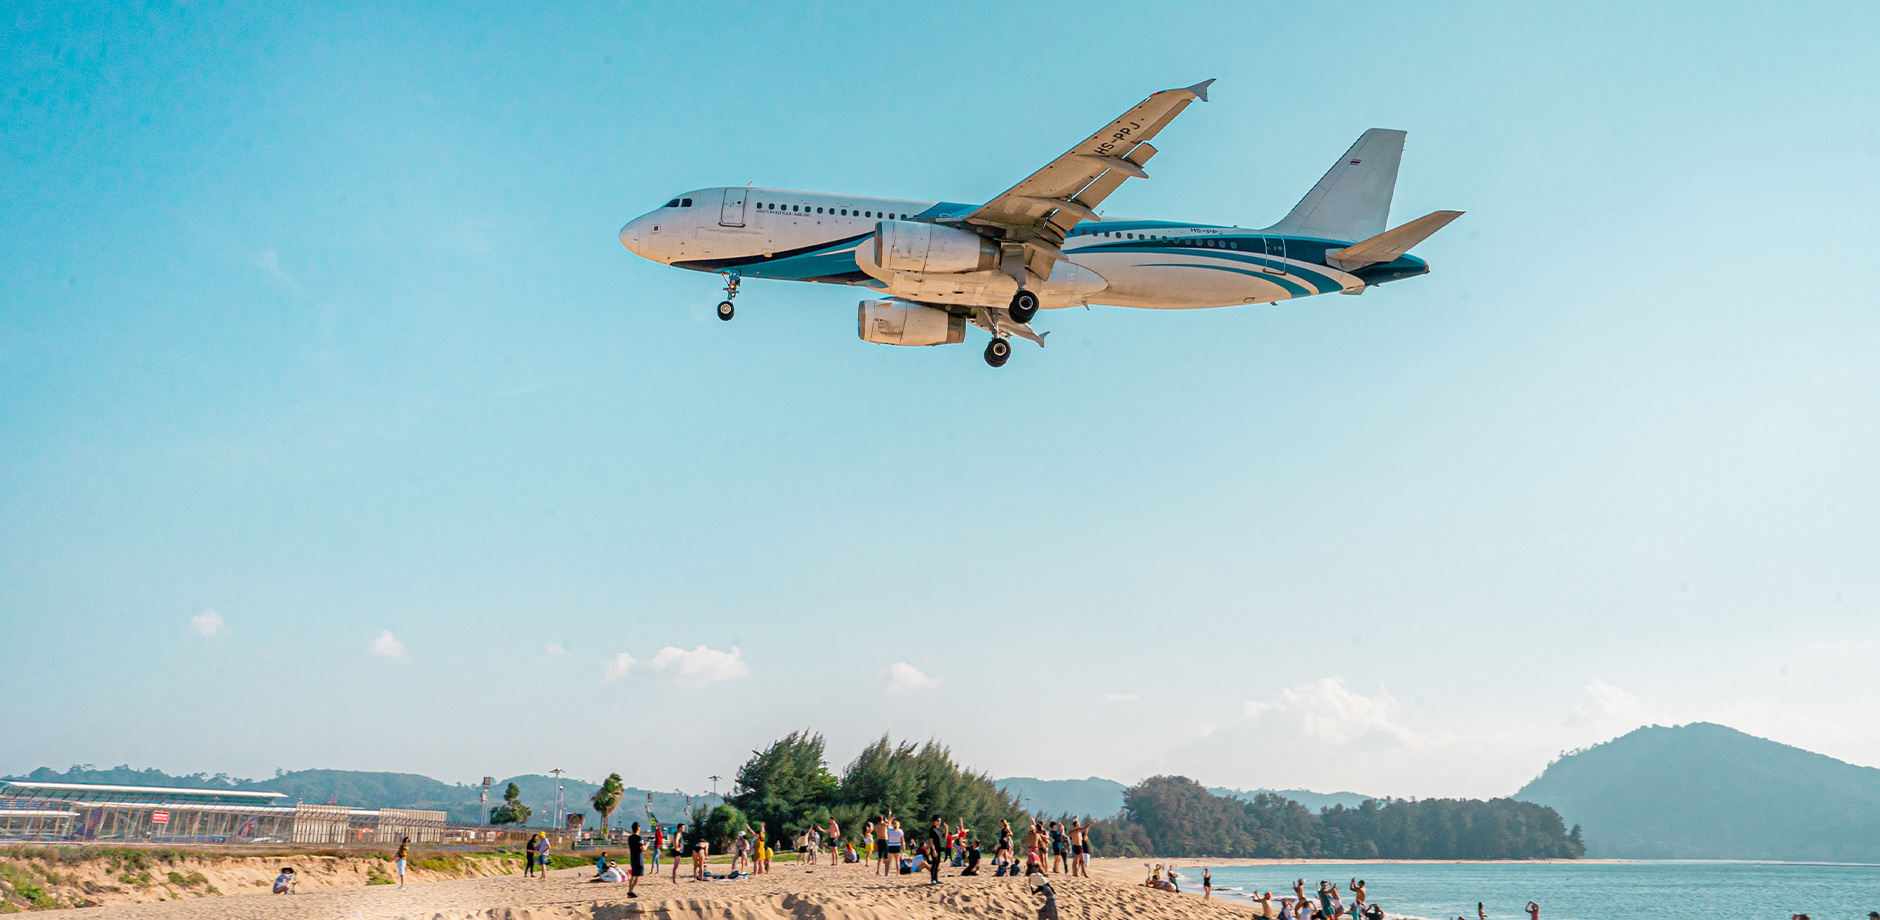 Пляж с самолетами Mai Khao beach